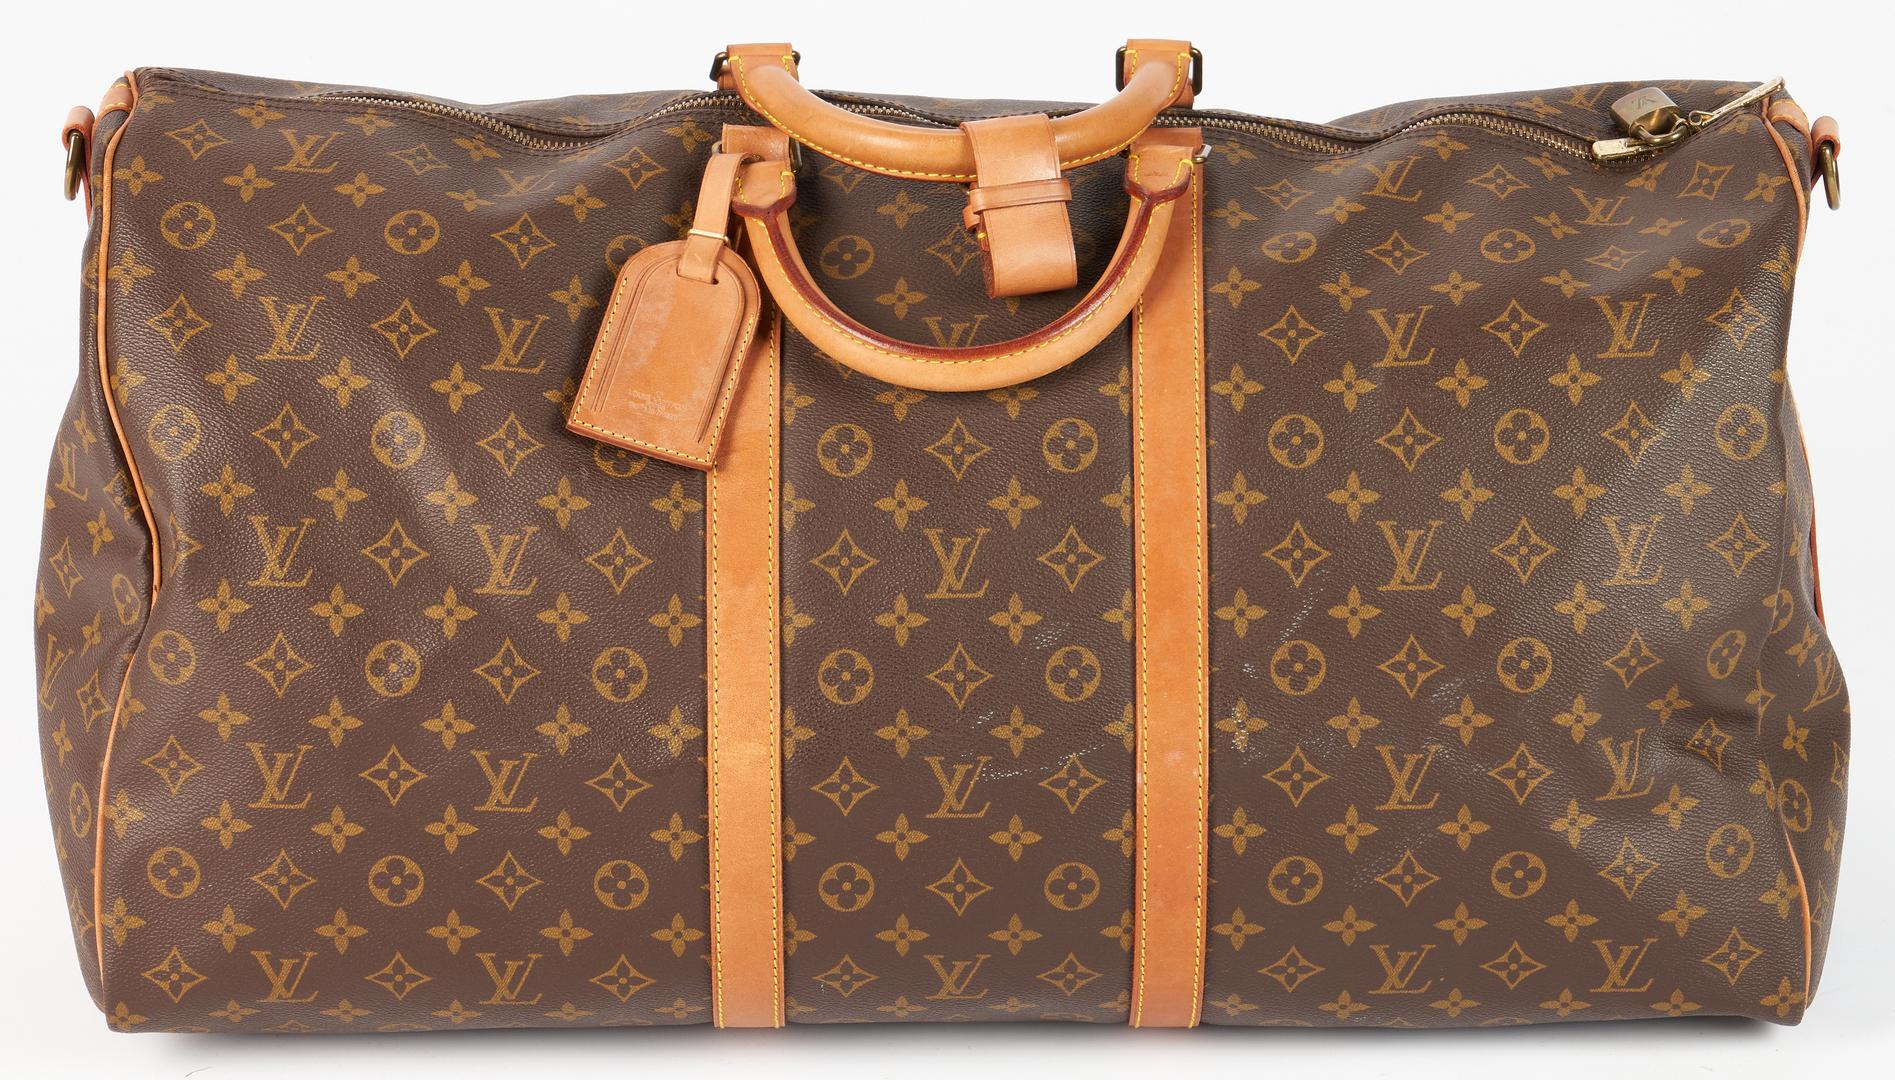 Lot 937: Louis Vuitton Keepall Duffle Bag